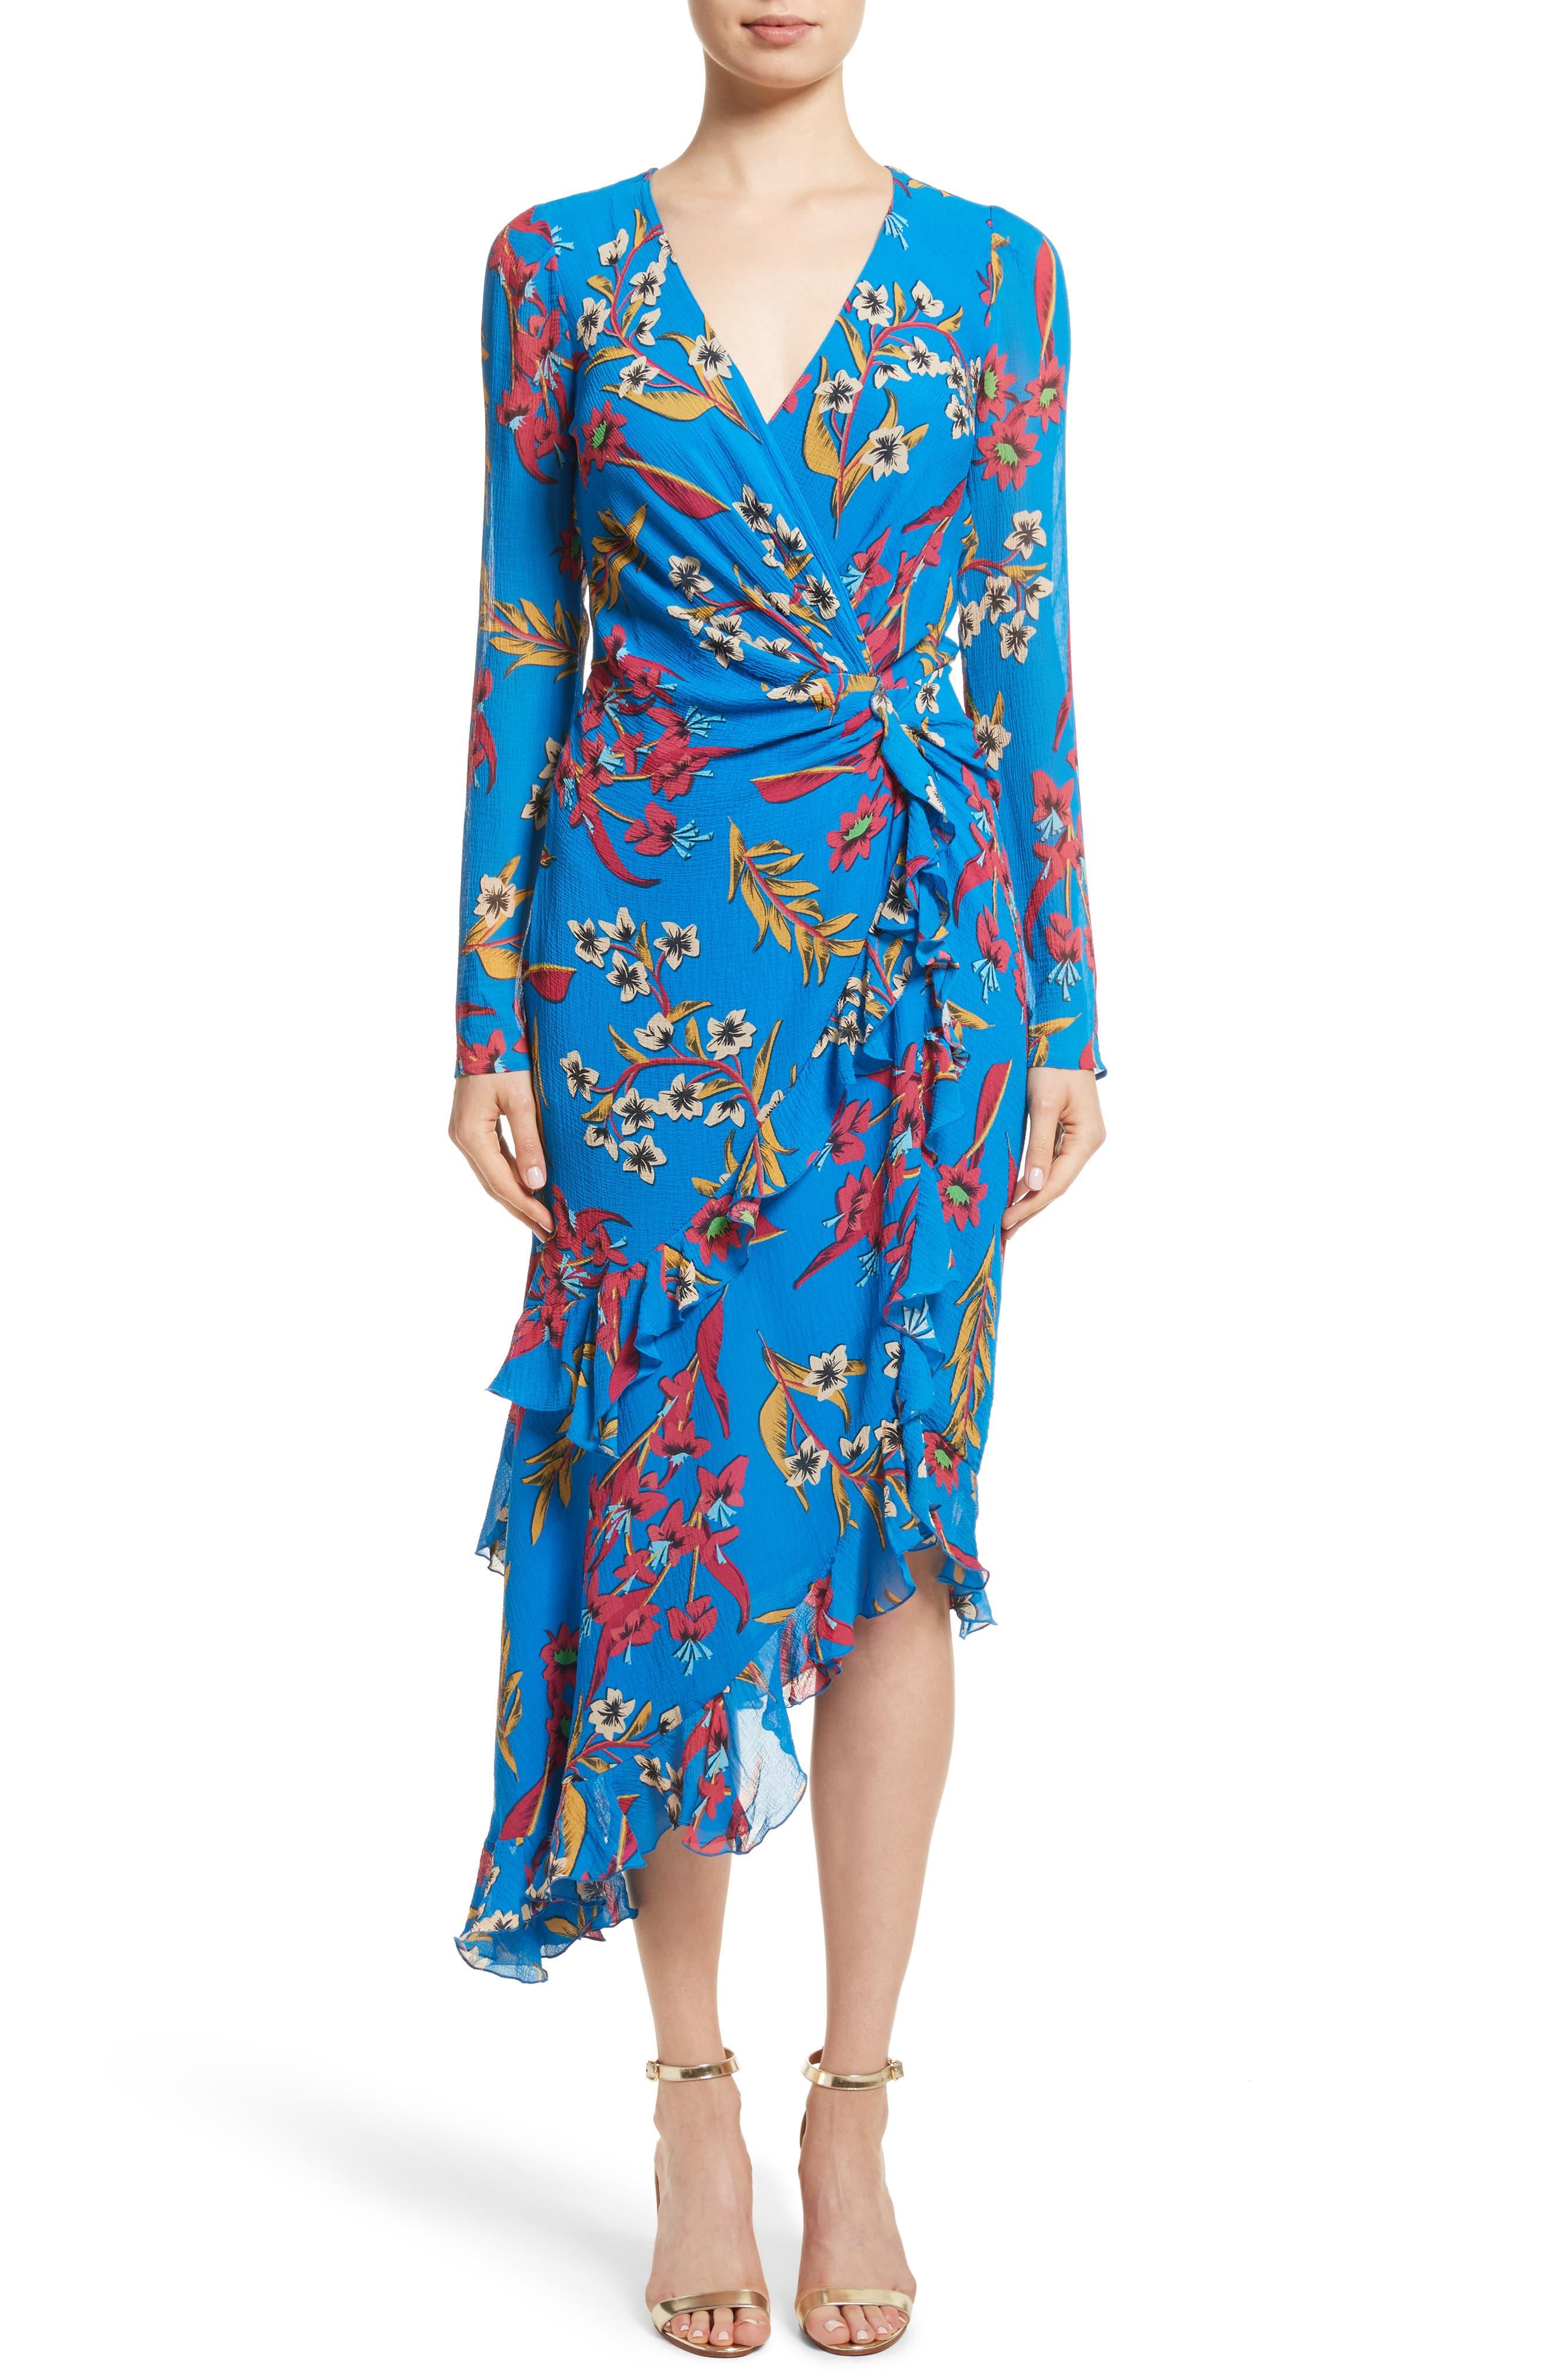 Jungle Floral Print Asymmetrical Ruffle Dress,                         Main,                         color, 410